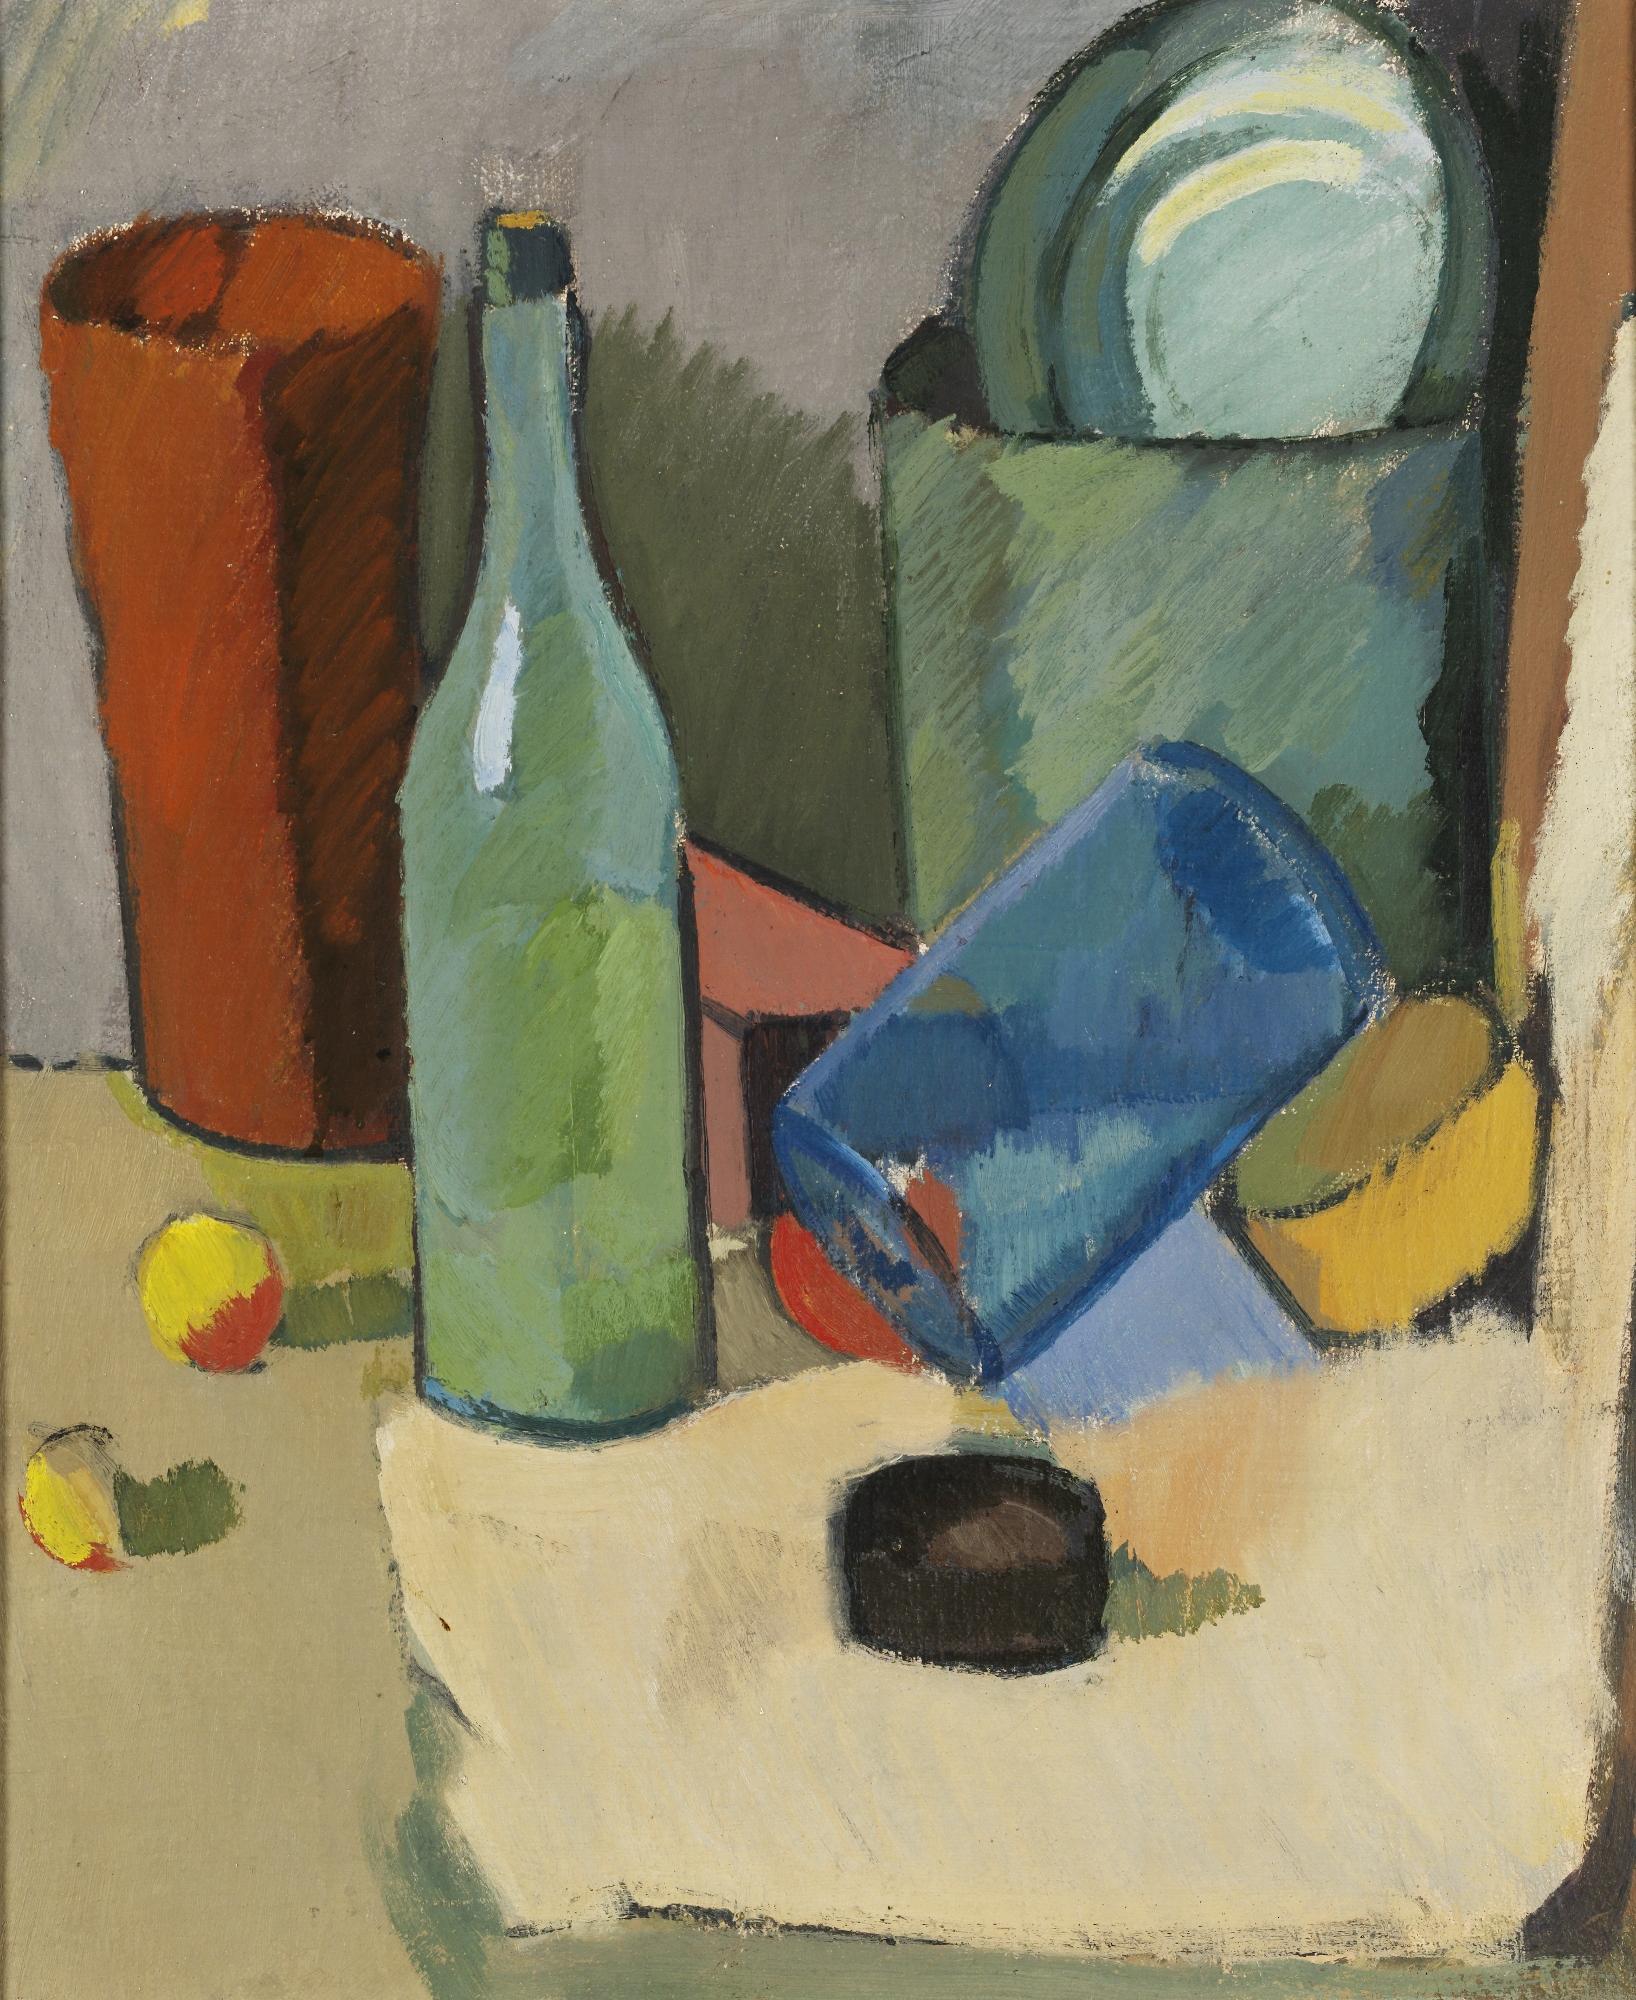 Still Life With a Bottle, 1923-24 - Alexander Rusakov